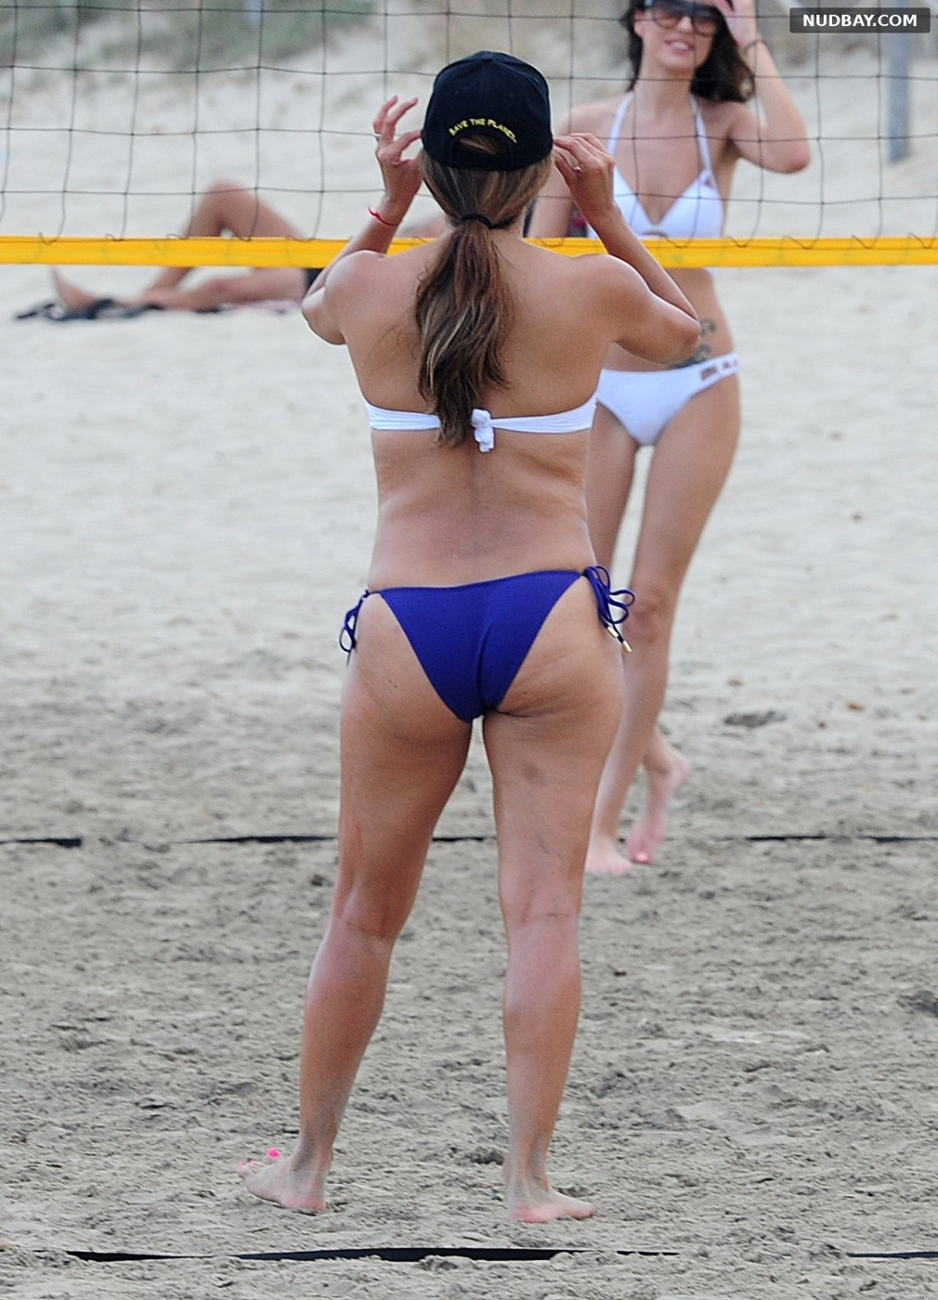 Eva Longoria Ass wears a bikini as she plays some beach volleyball in Ibiza Jul 21 2017